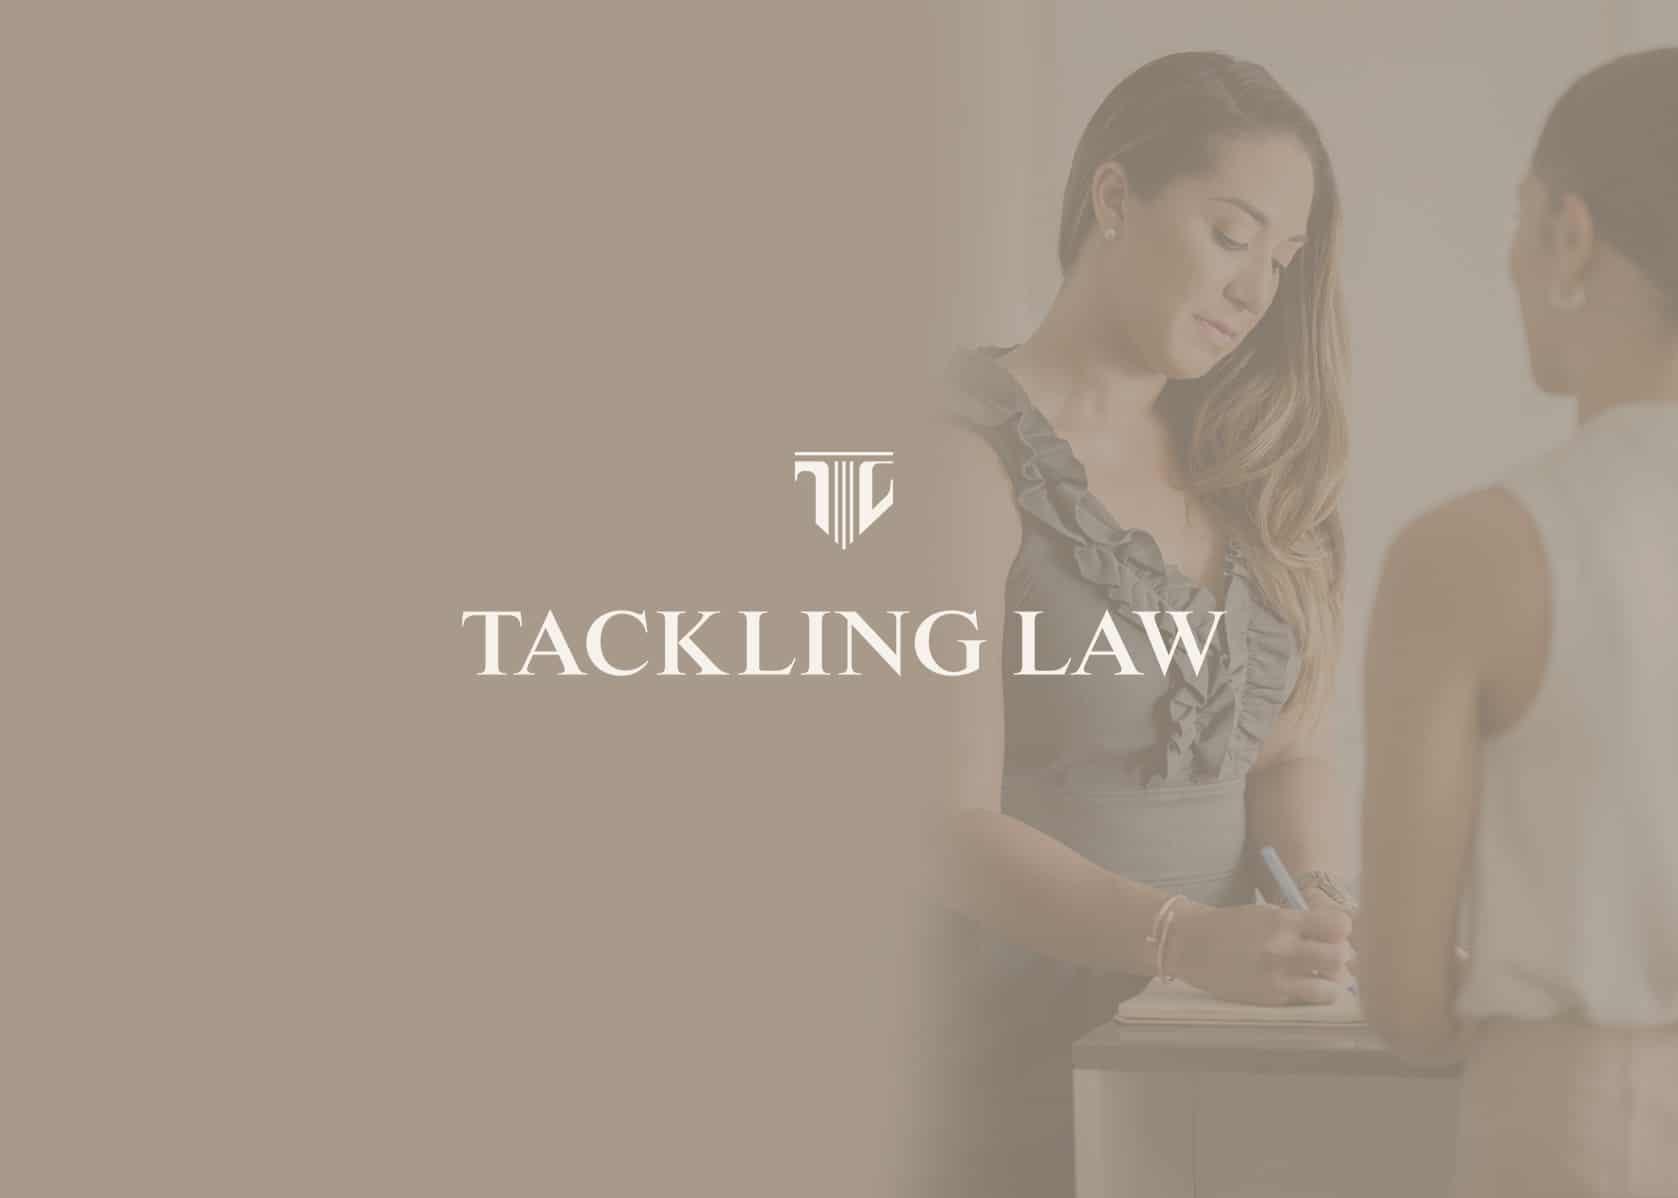 tackling law, law firm branding, brand identity lawyer